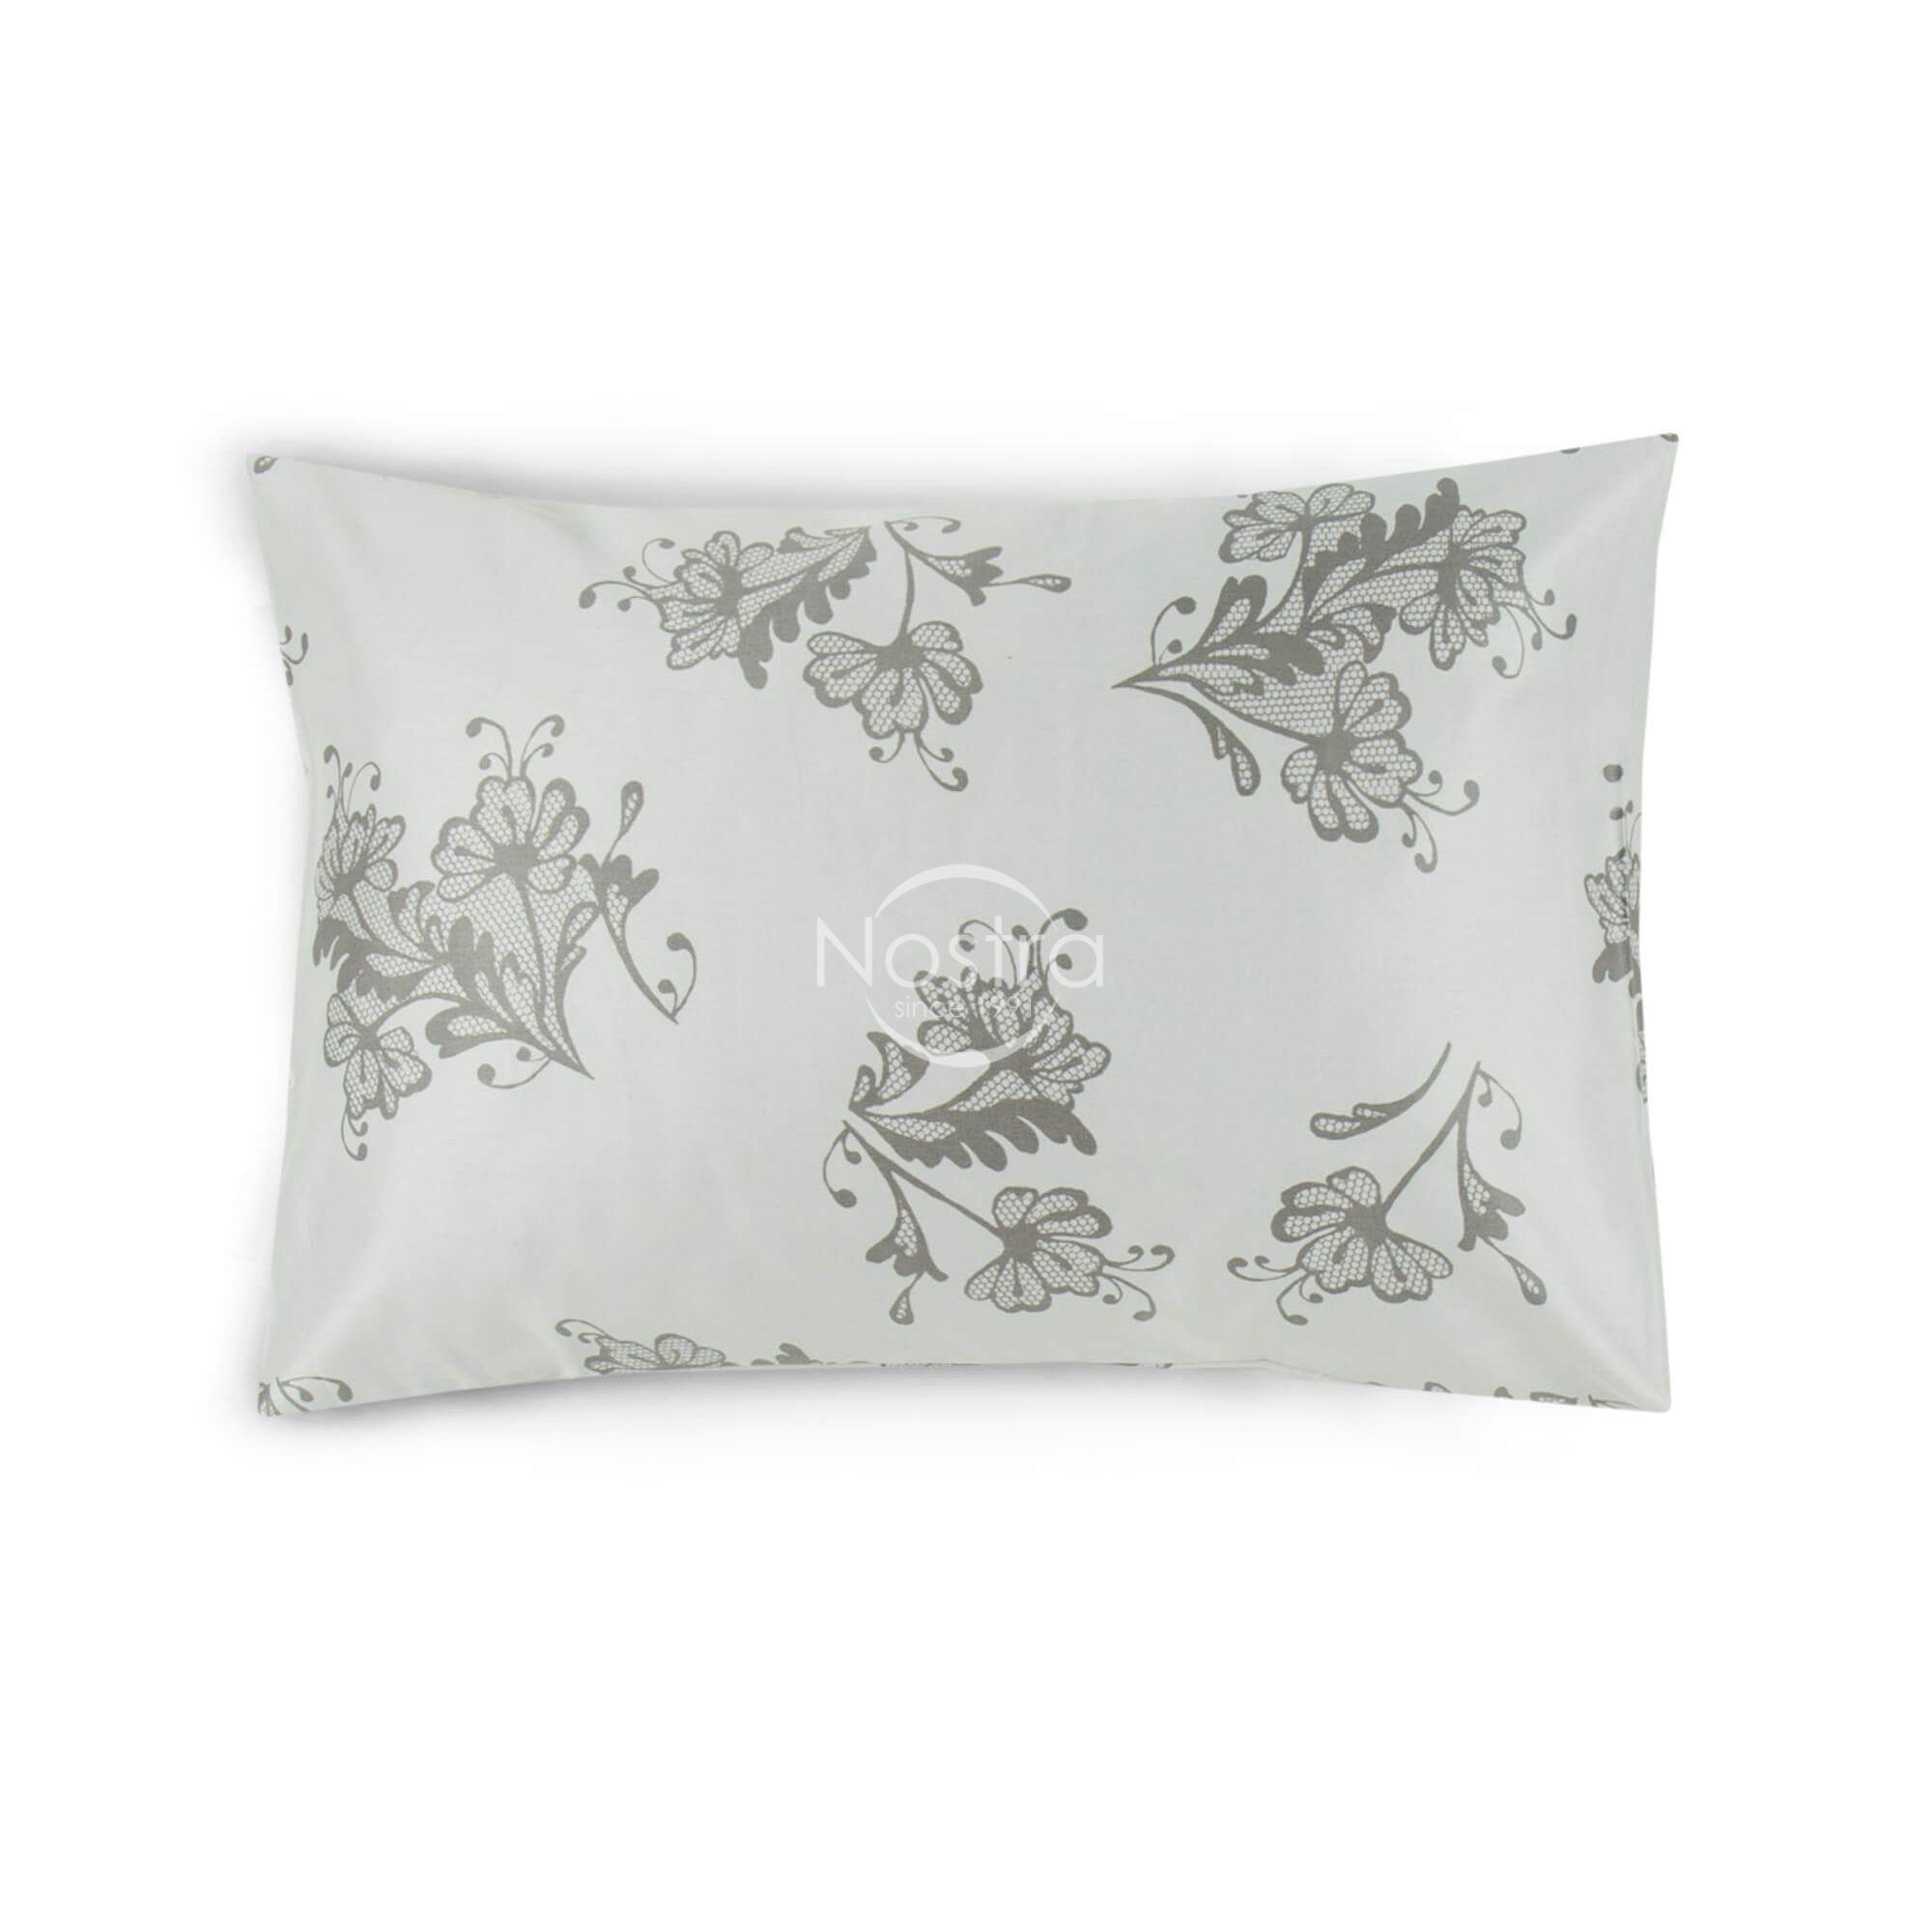 Satino pagalvės užvalkalas 20-1447-L.GREY 50x70 cm